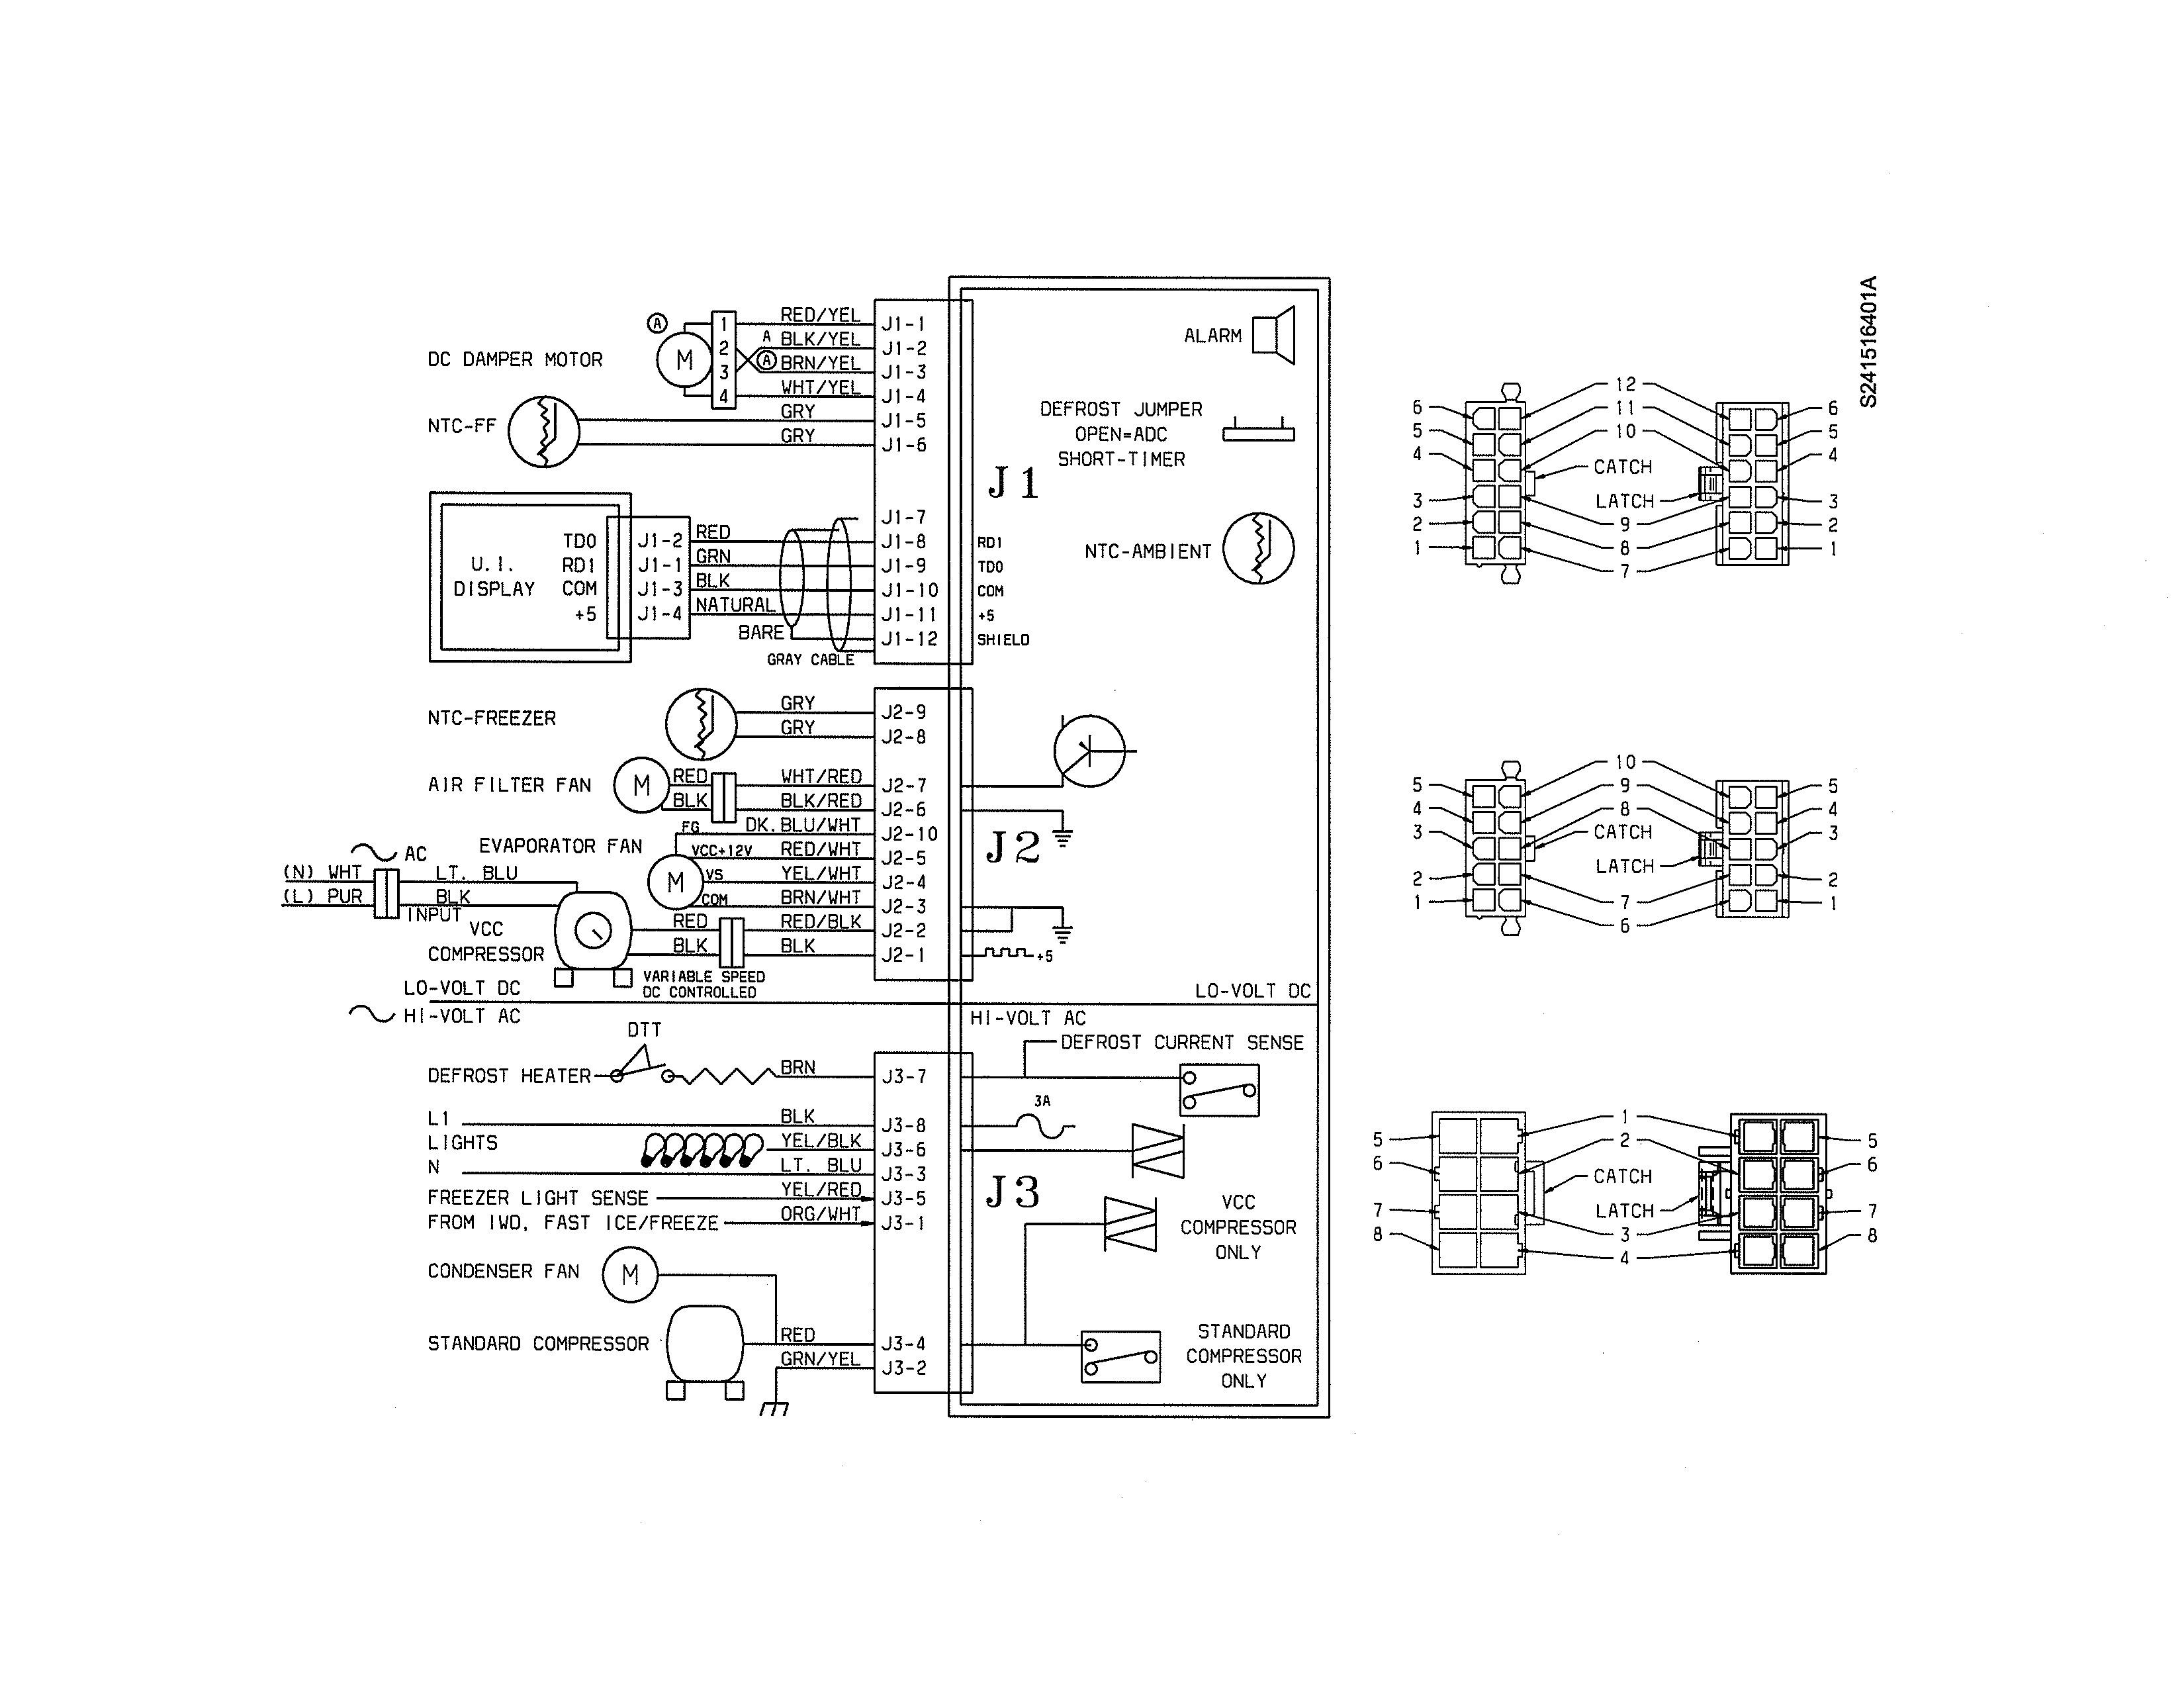 kenmore refrigerator wiring diagram Download-Refrigeration Wiring Diagram Symbols Refrence Kenmore Elite Refrigerator Wiring Diagram Roc Grp 20-e